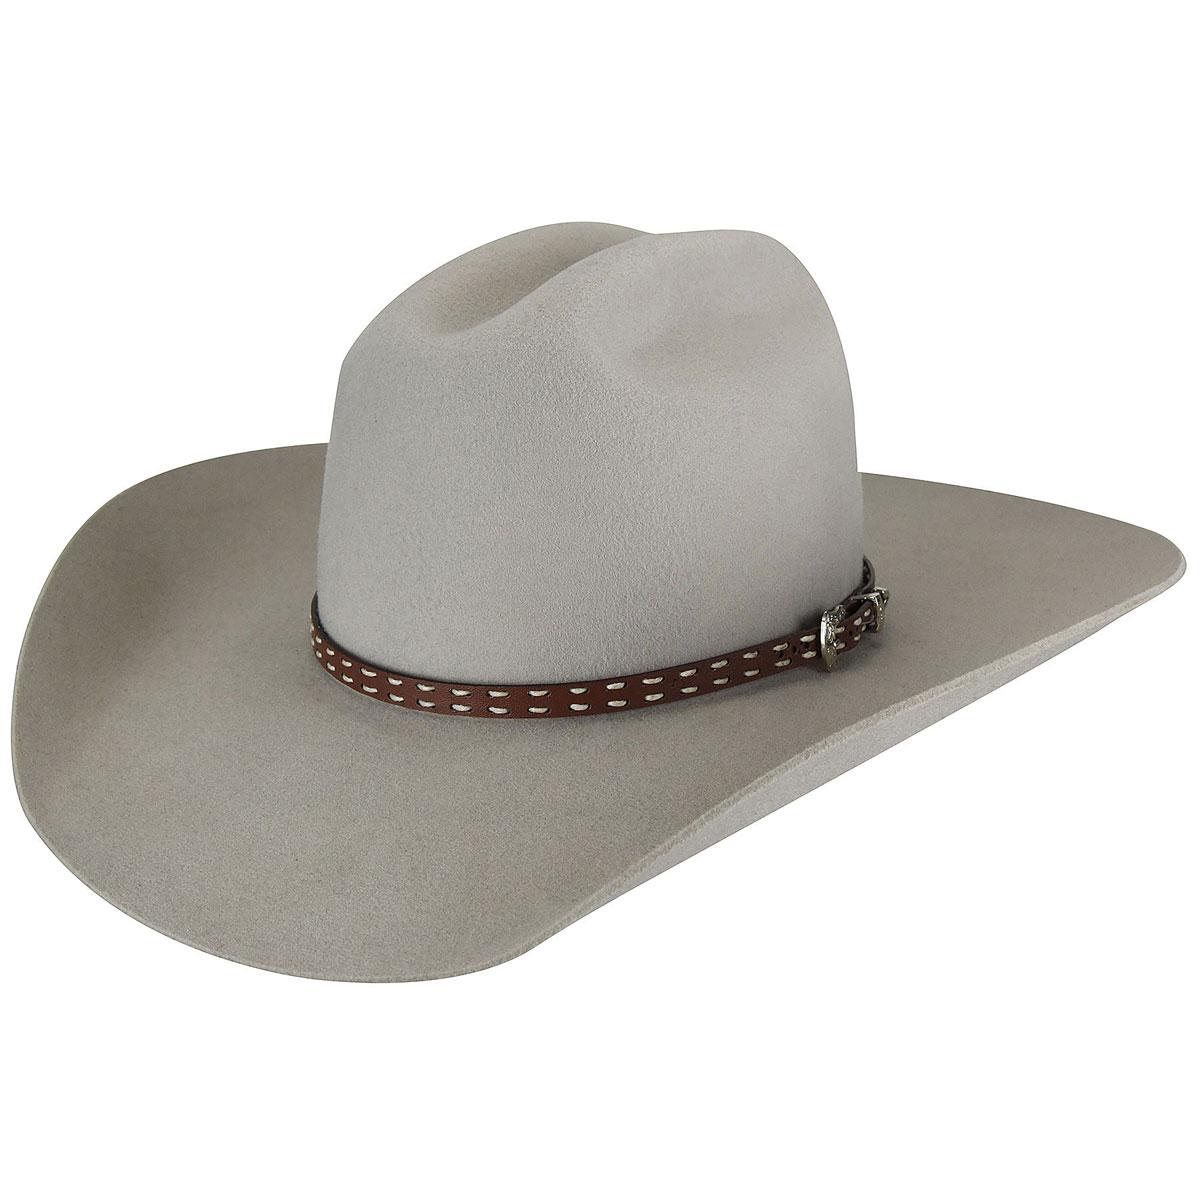 Stampede 2X Quality Wool Felt White hat